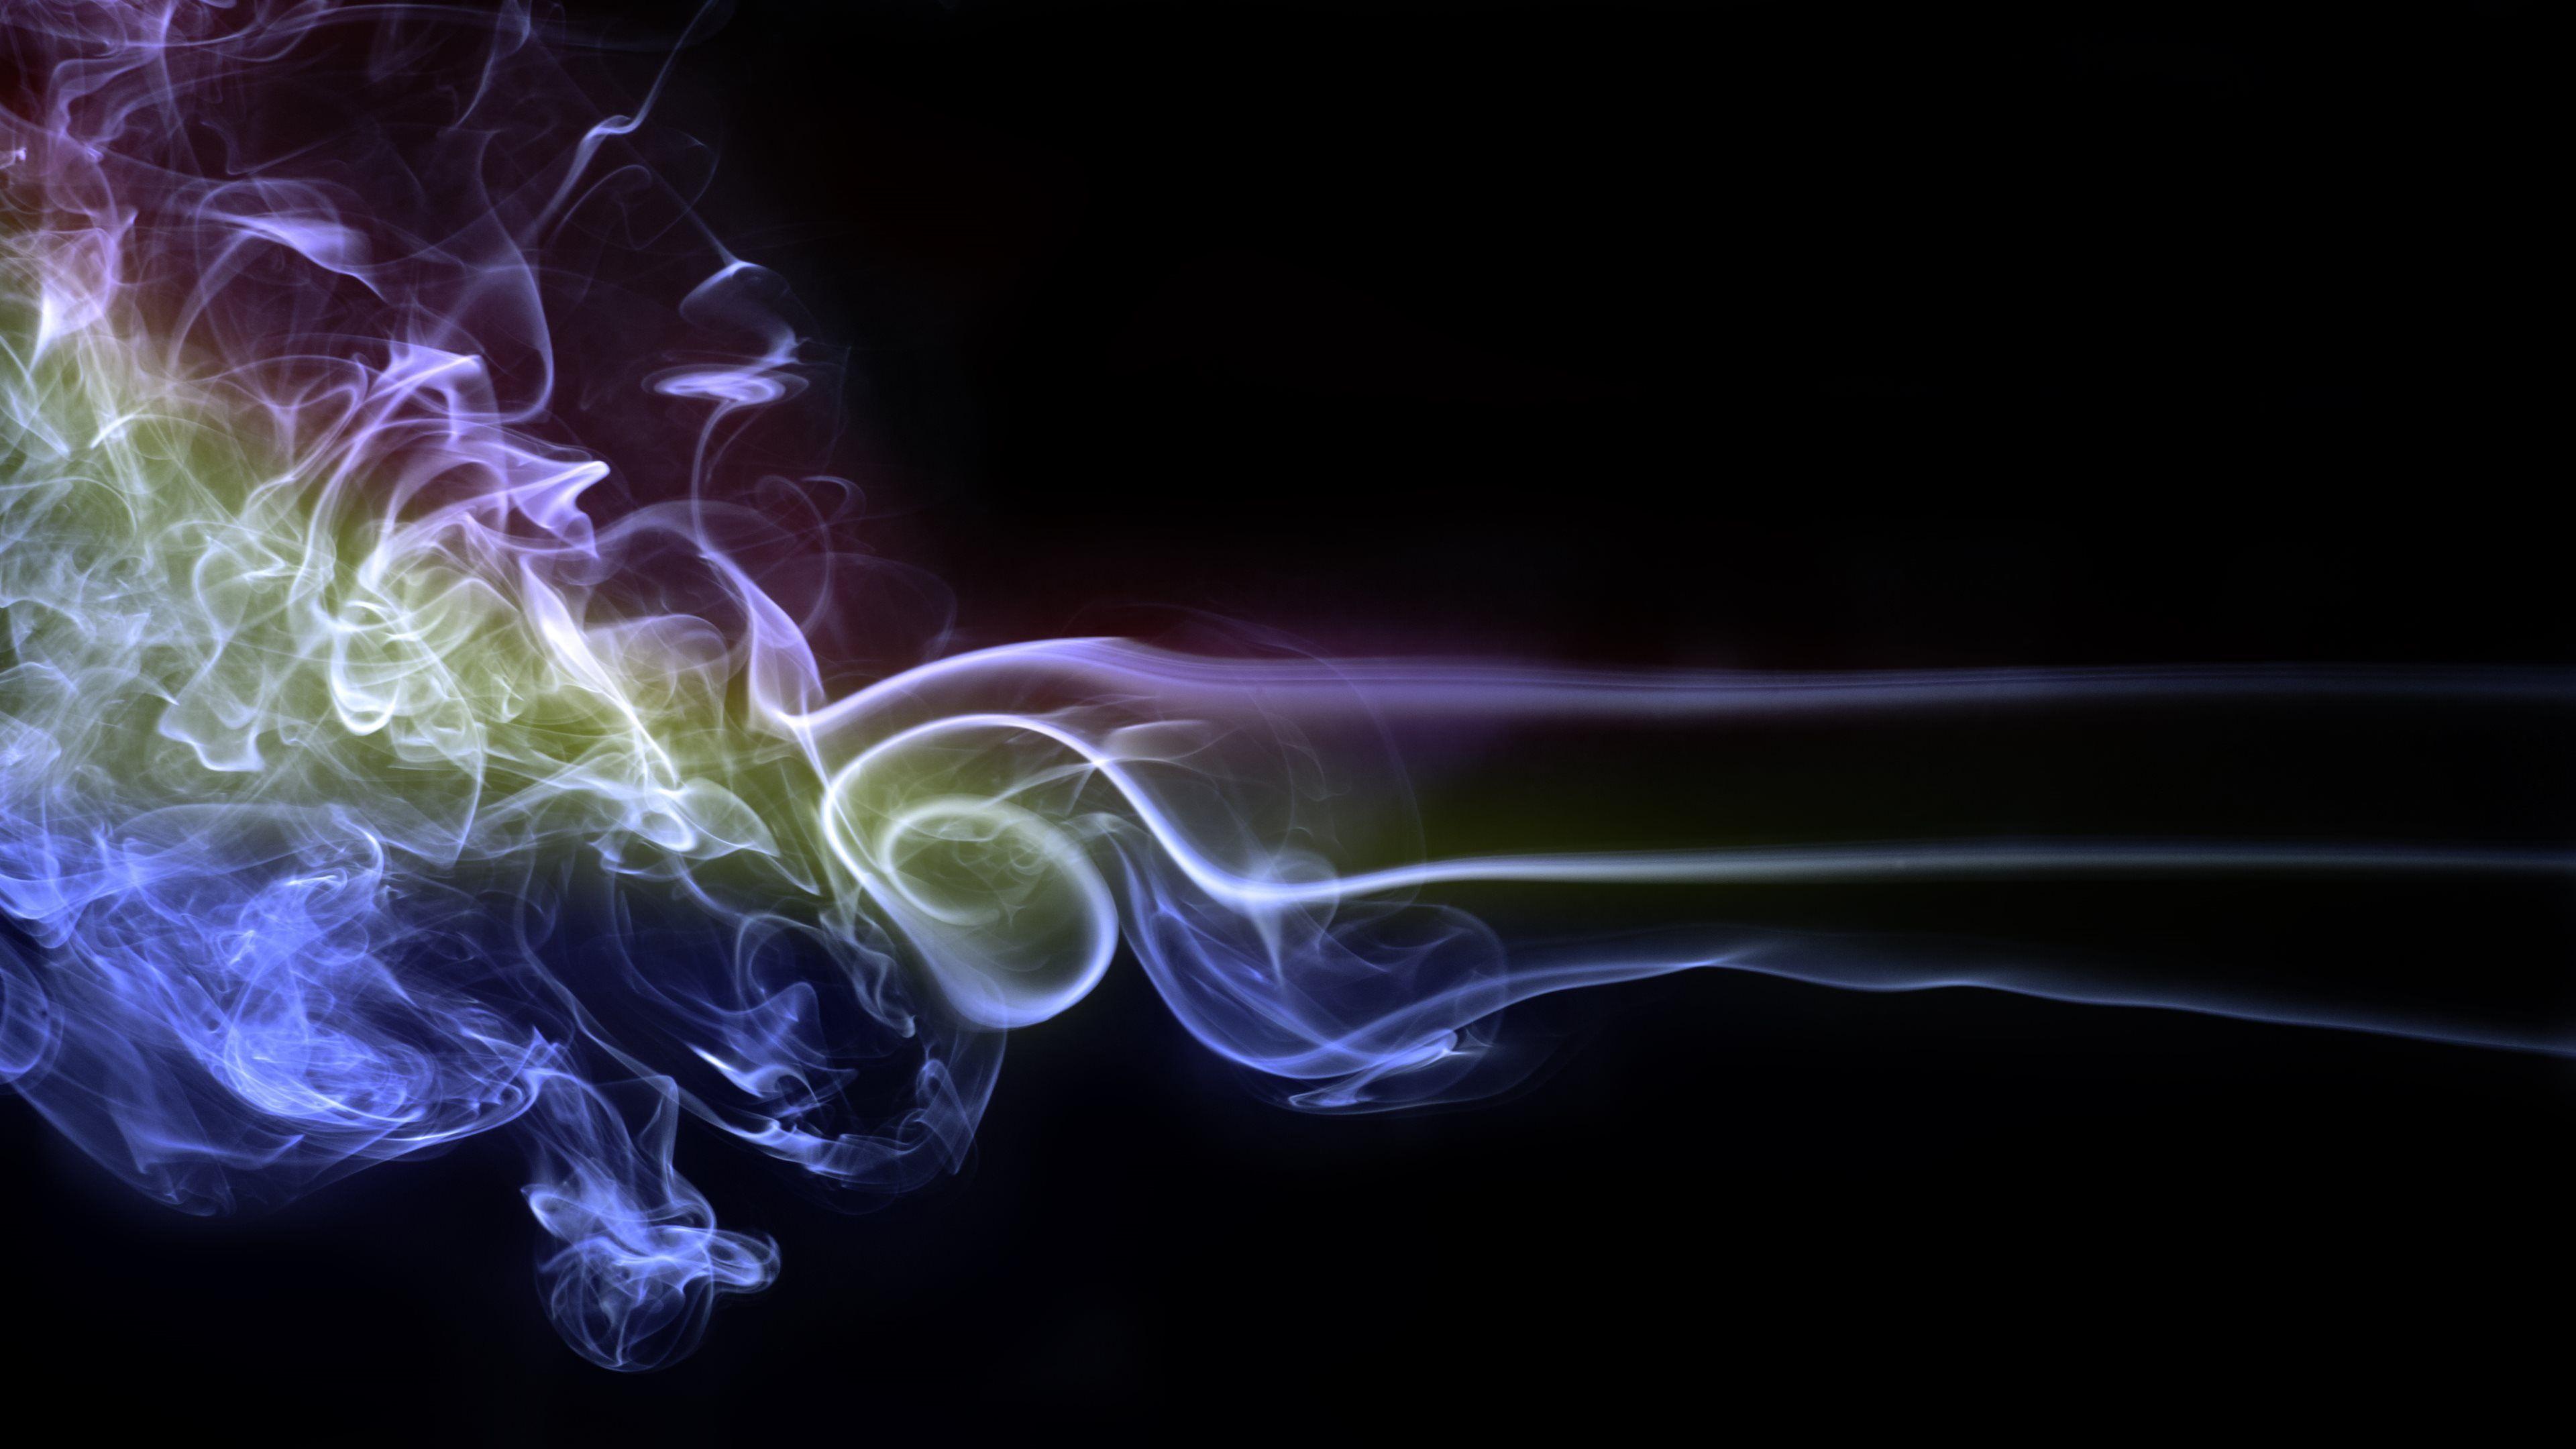 Colorful Smoke Photography Wallpaper « Pin HD Wallpapers ...